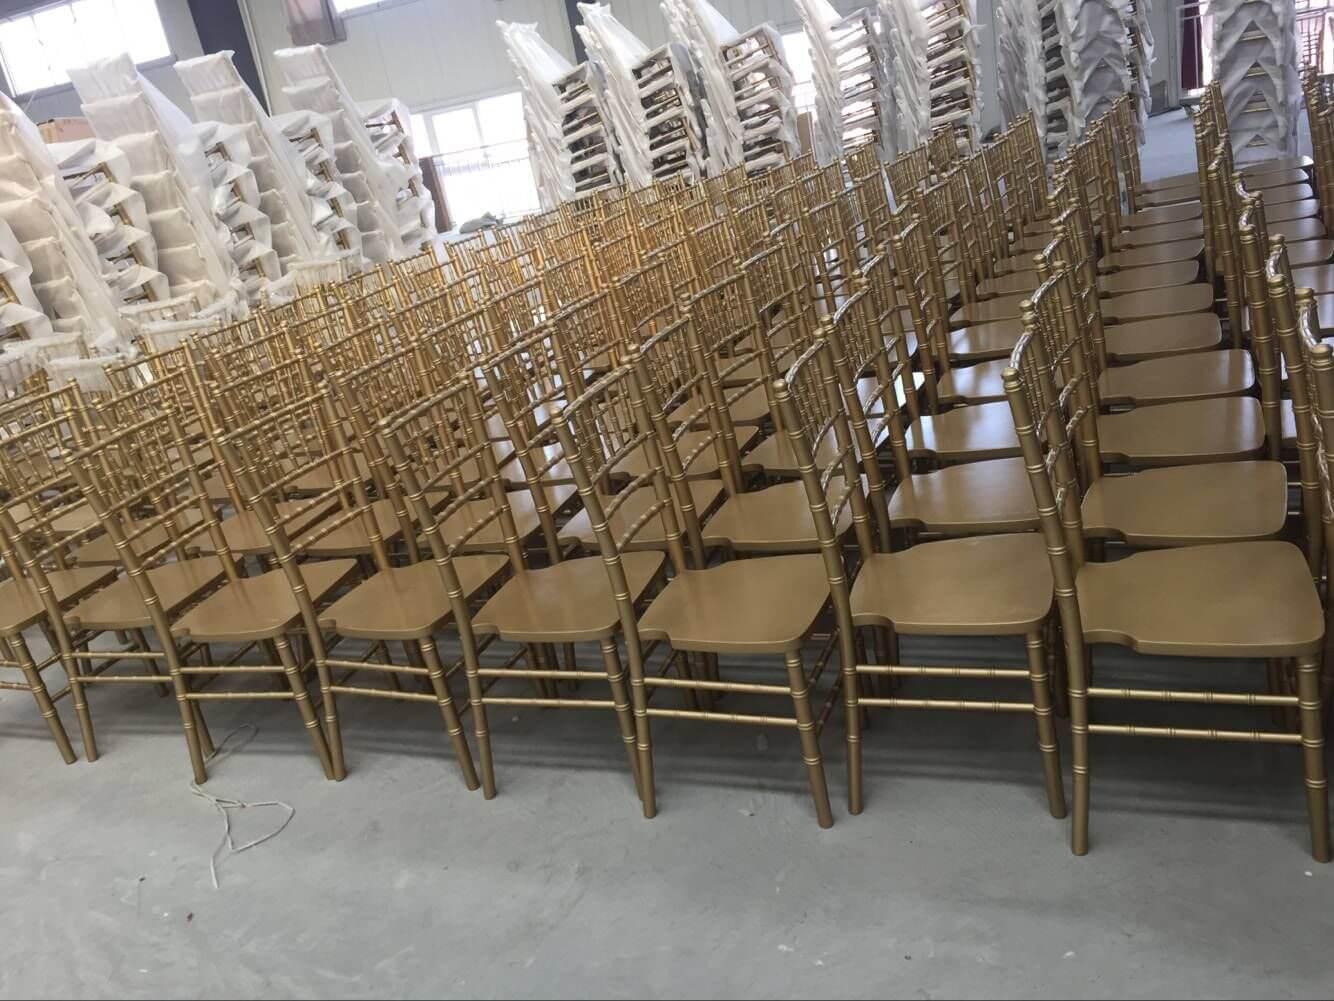 Primer painting of gold chiavari chairs